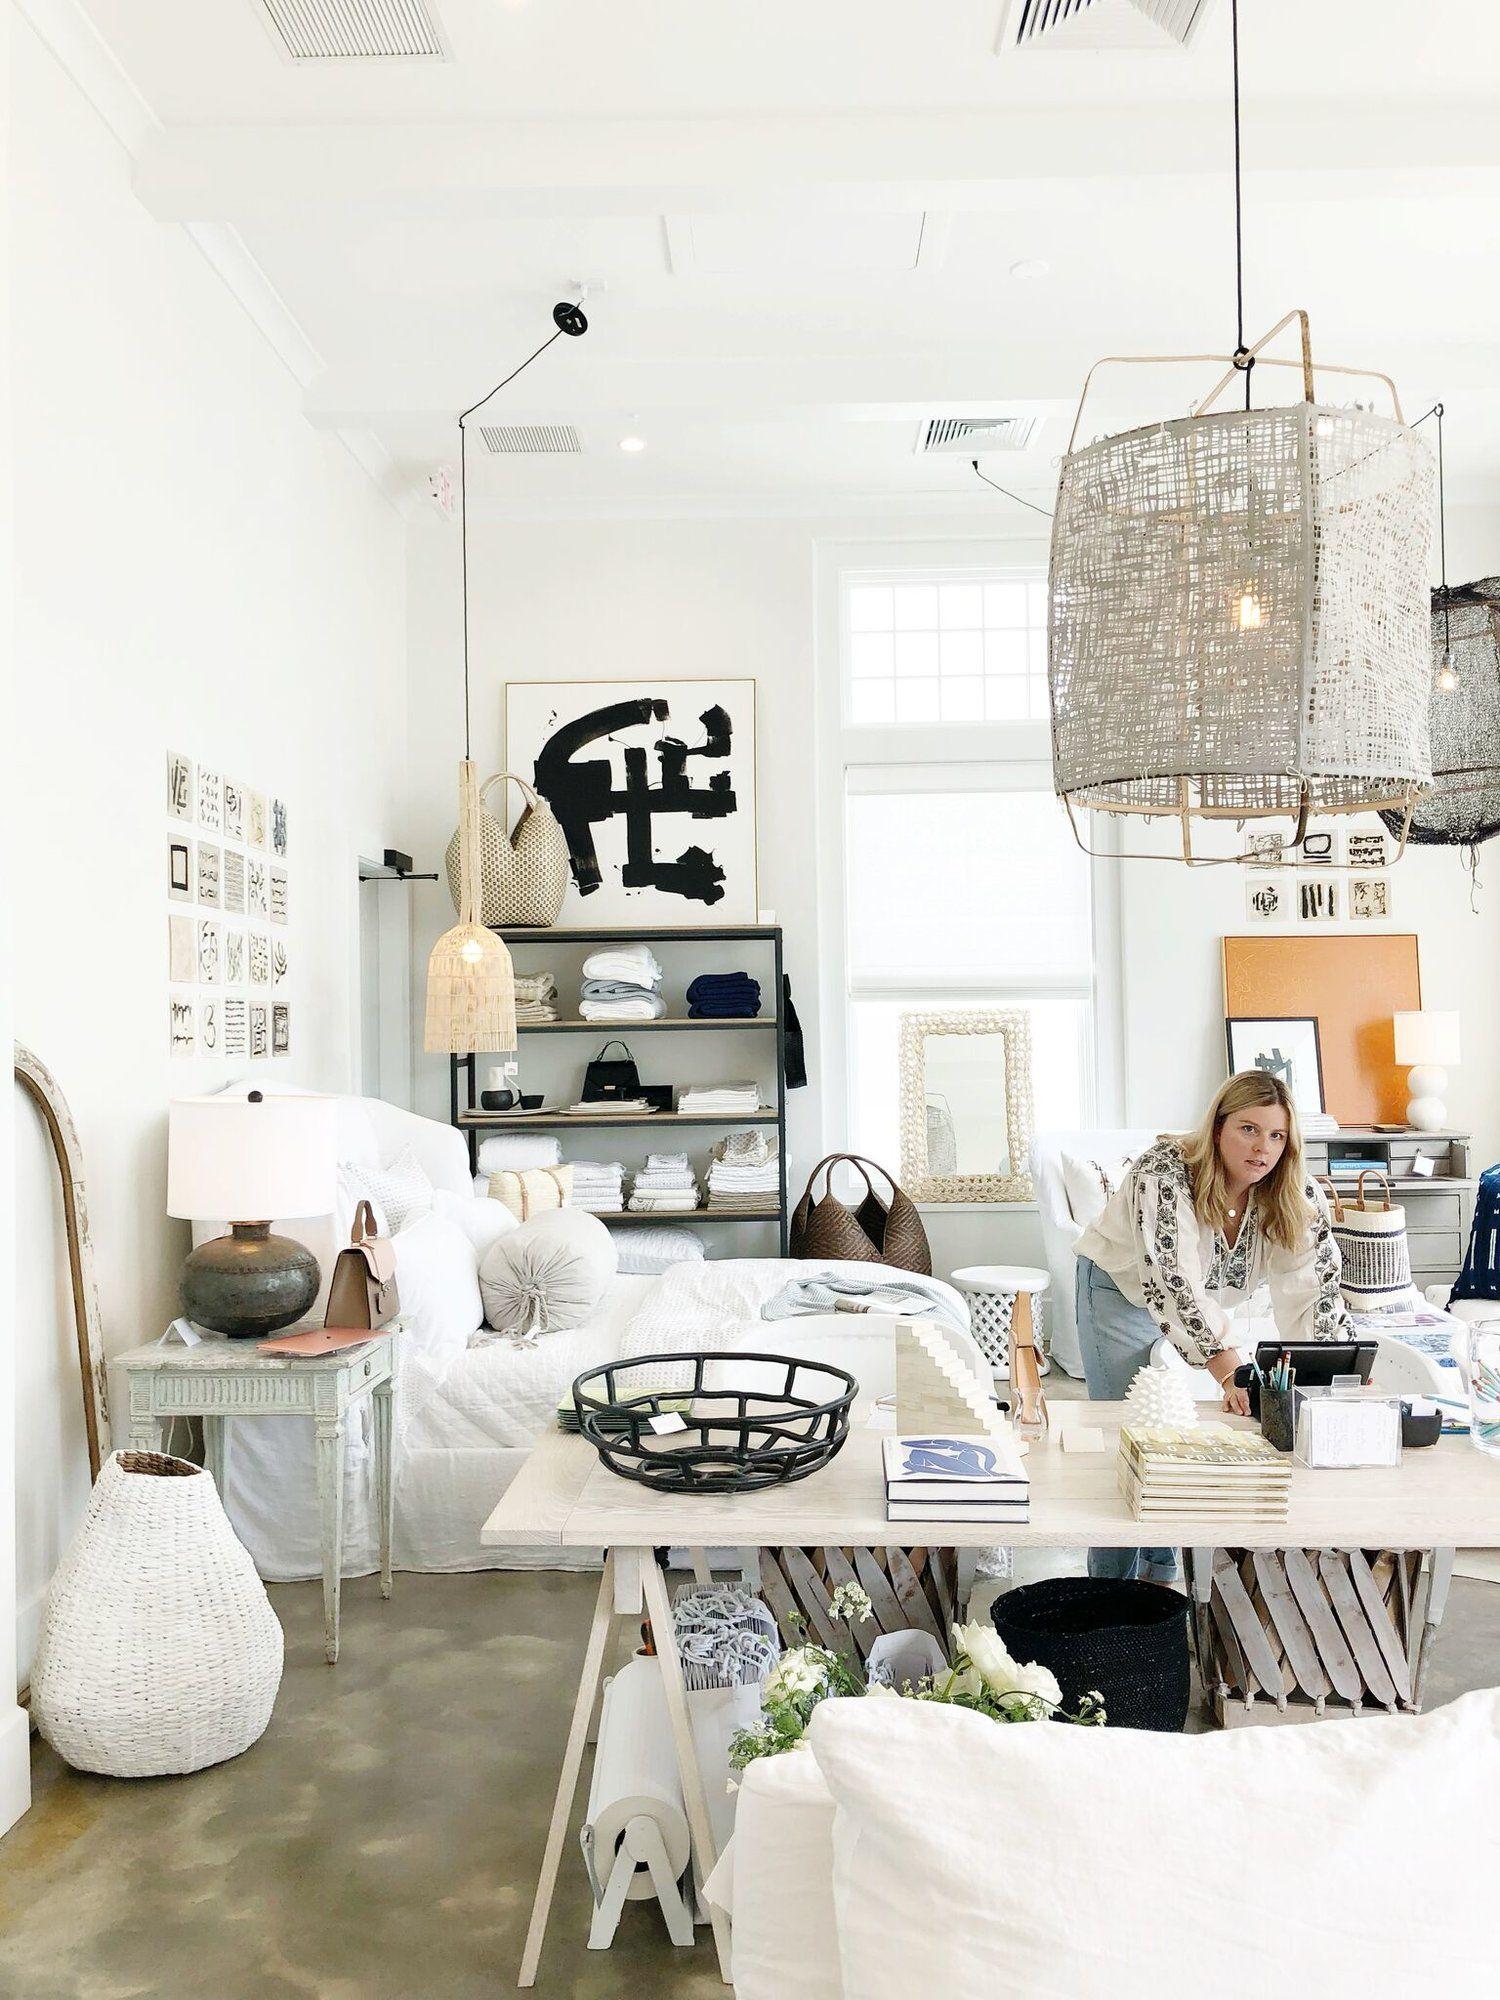 Our Guide to 30A | Bohemian decor, Home, Home decor